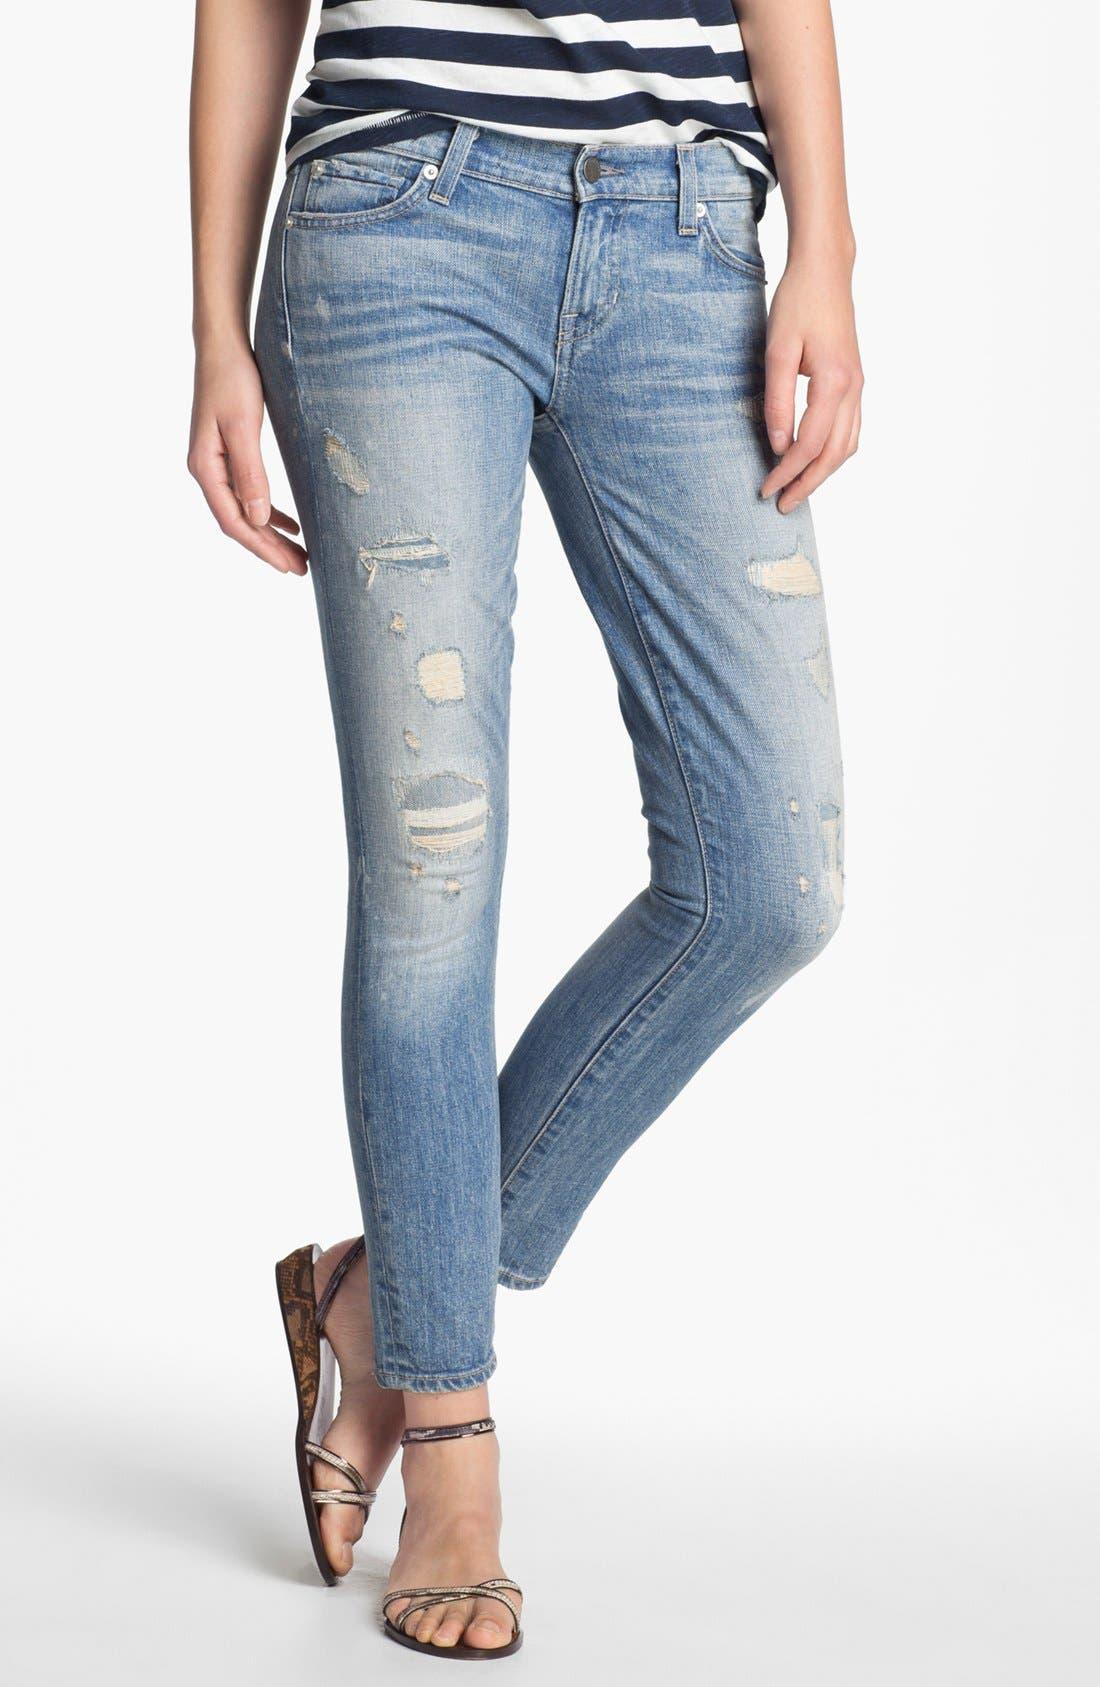 Main Image - TEXTILE Elizabeth and James 'Ozzy' Rip & Repair Jeans